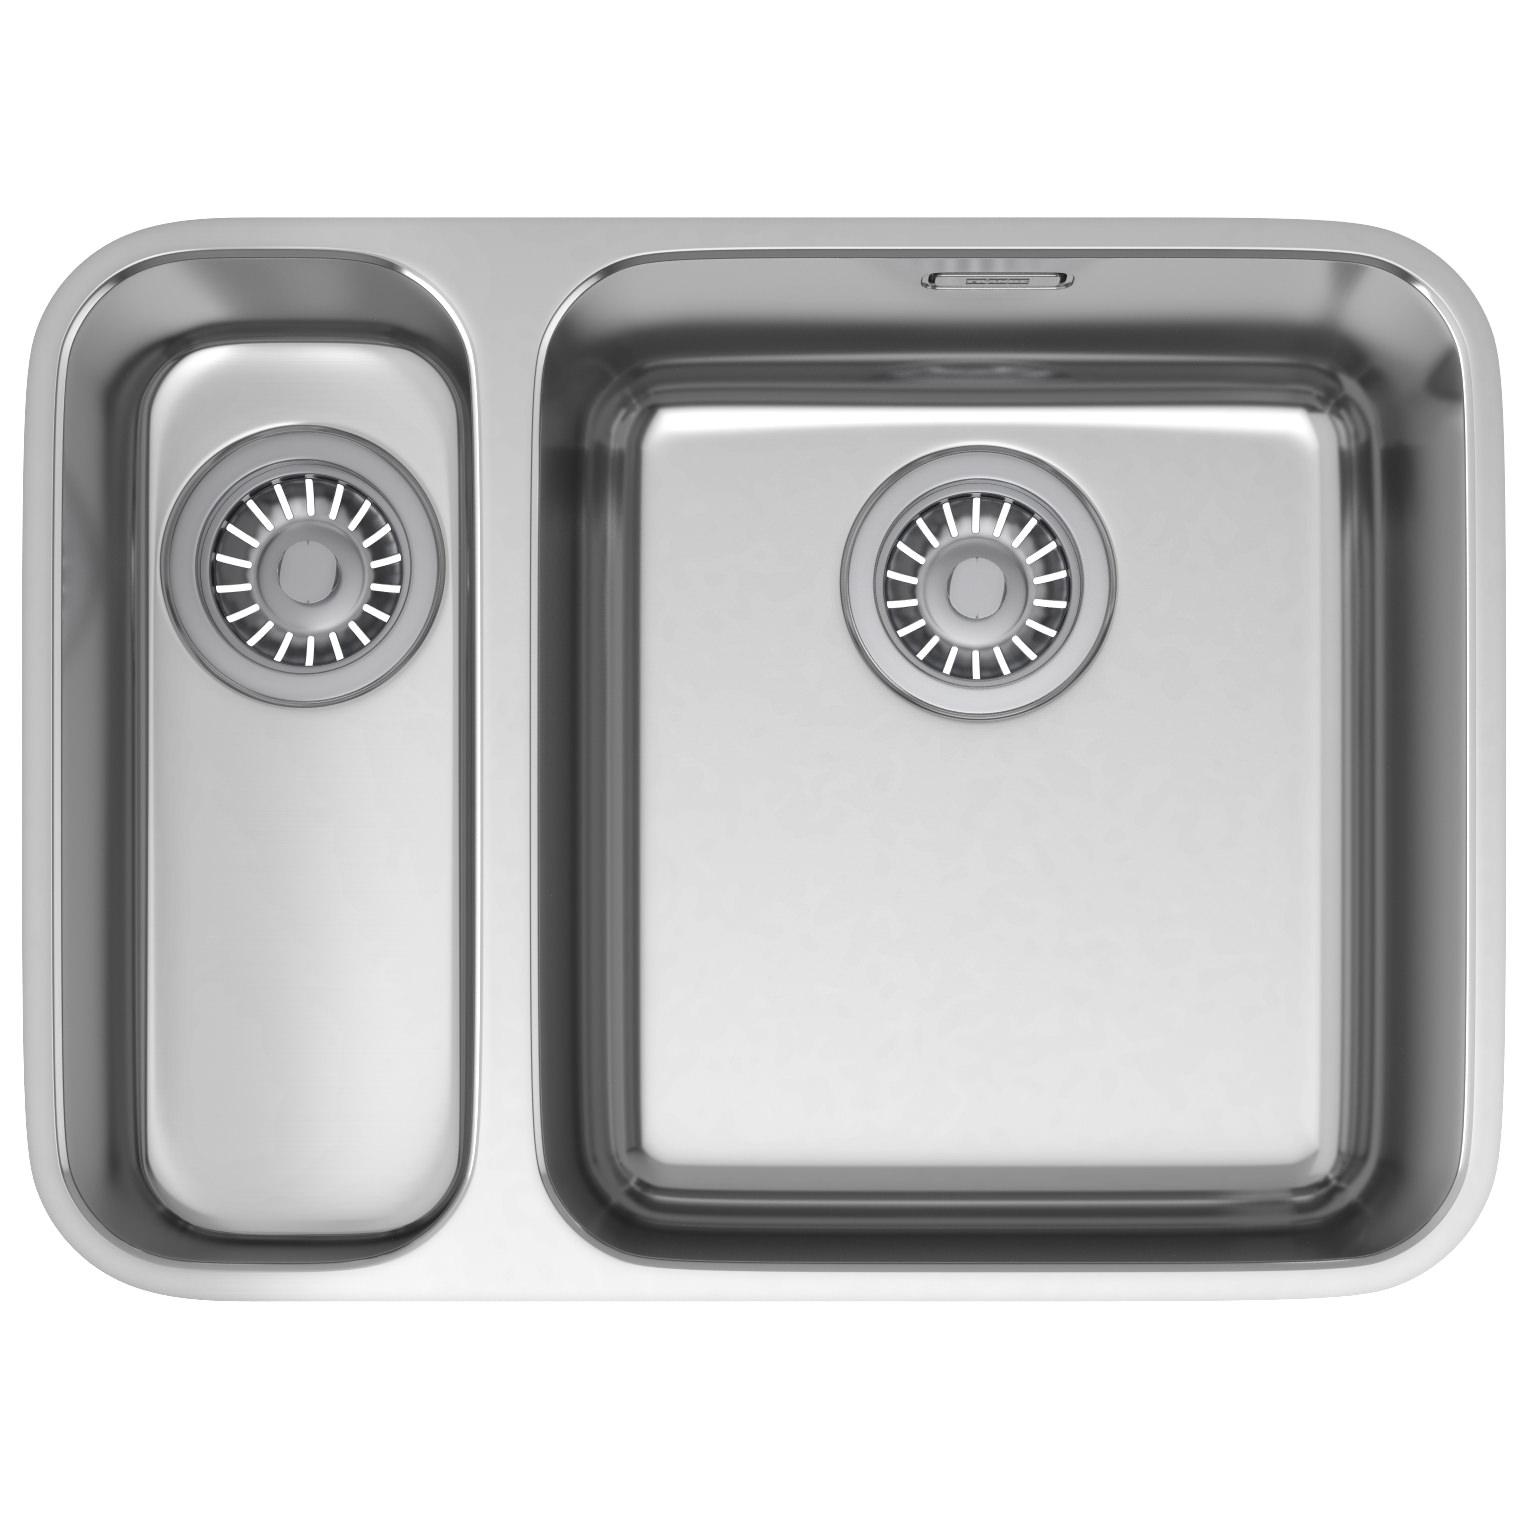 Franke Largo LAX 160 36-16 Stainless Steel 1.5 Bowl Undermount Sink